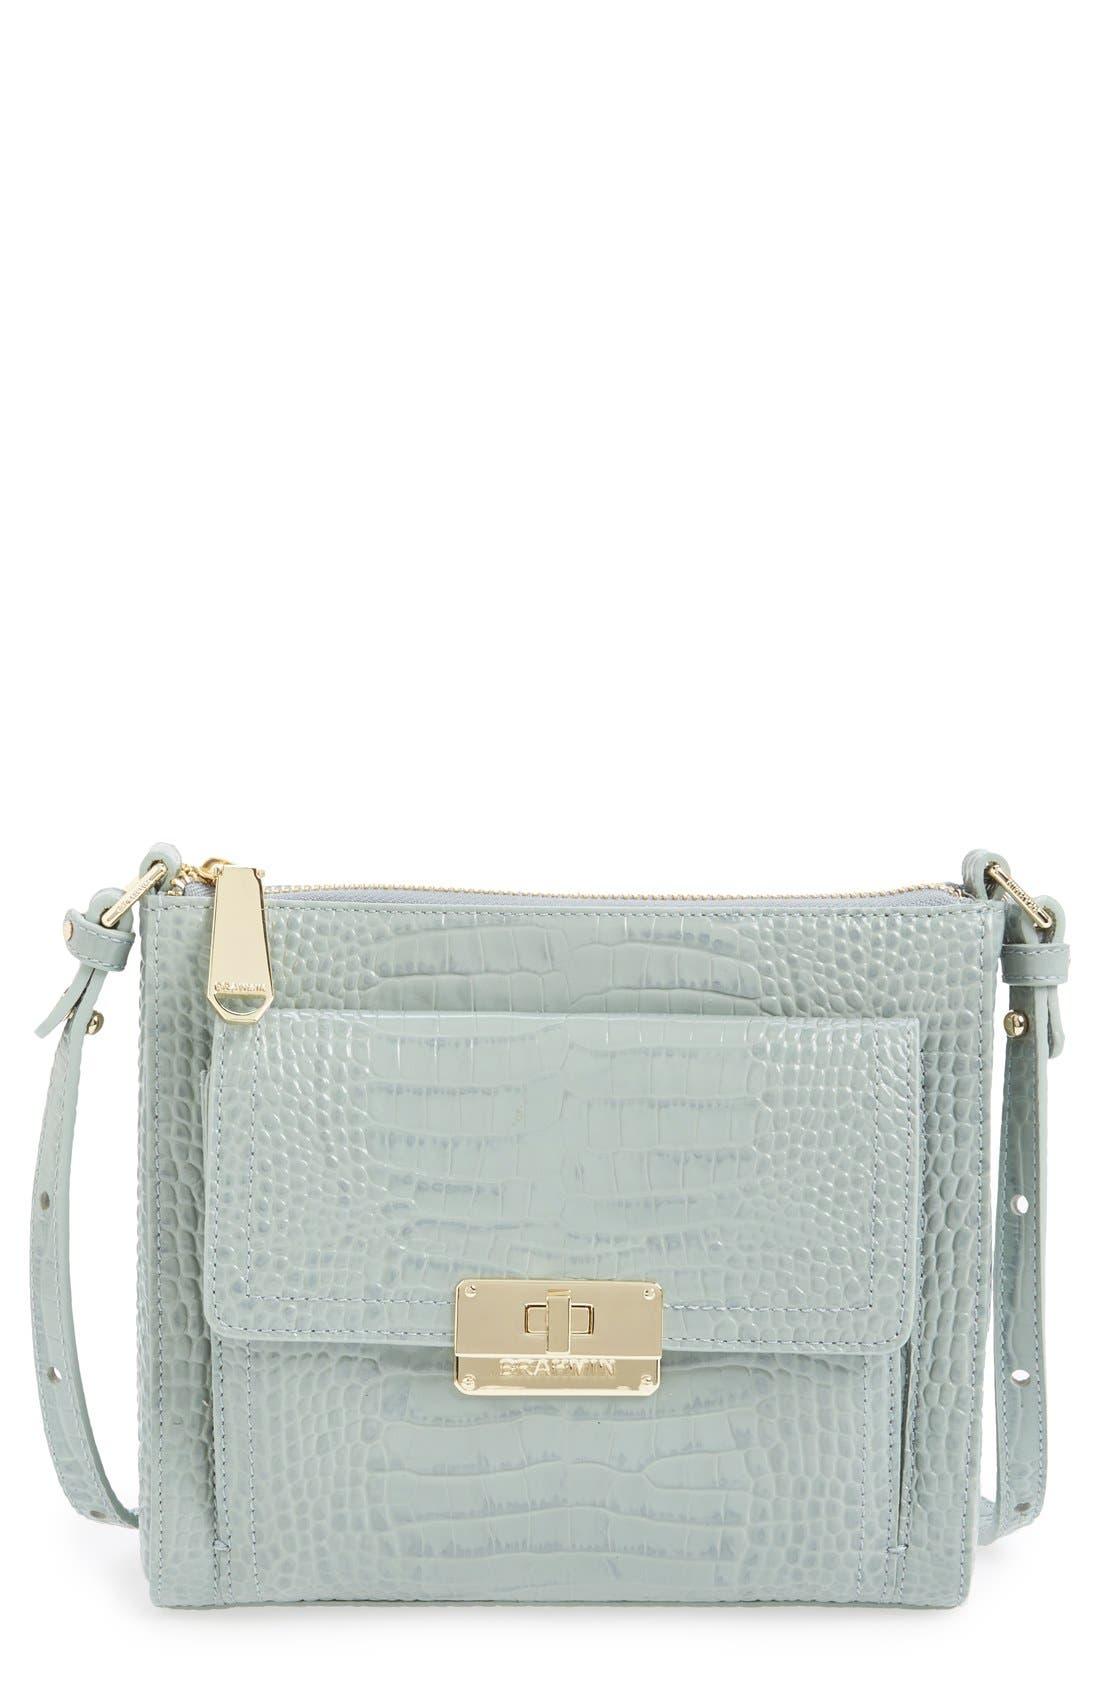 Alternate Image 1 Selected - Brahmin 'Mimosa' Croc Embossed Leather Crossbody Bag